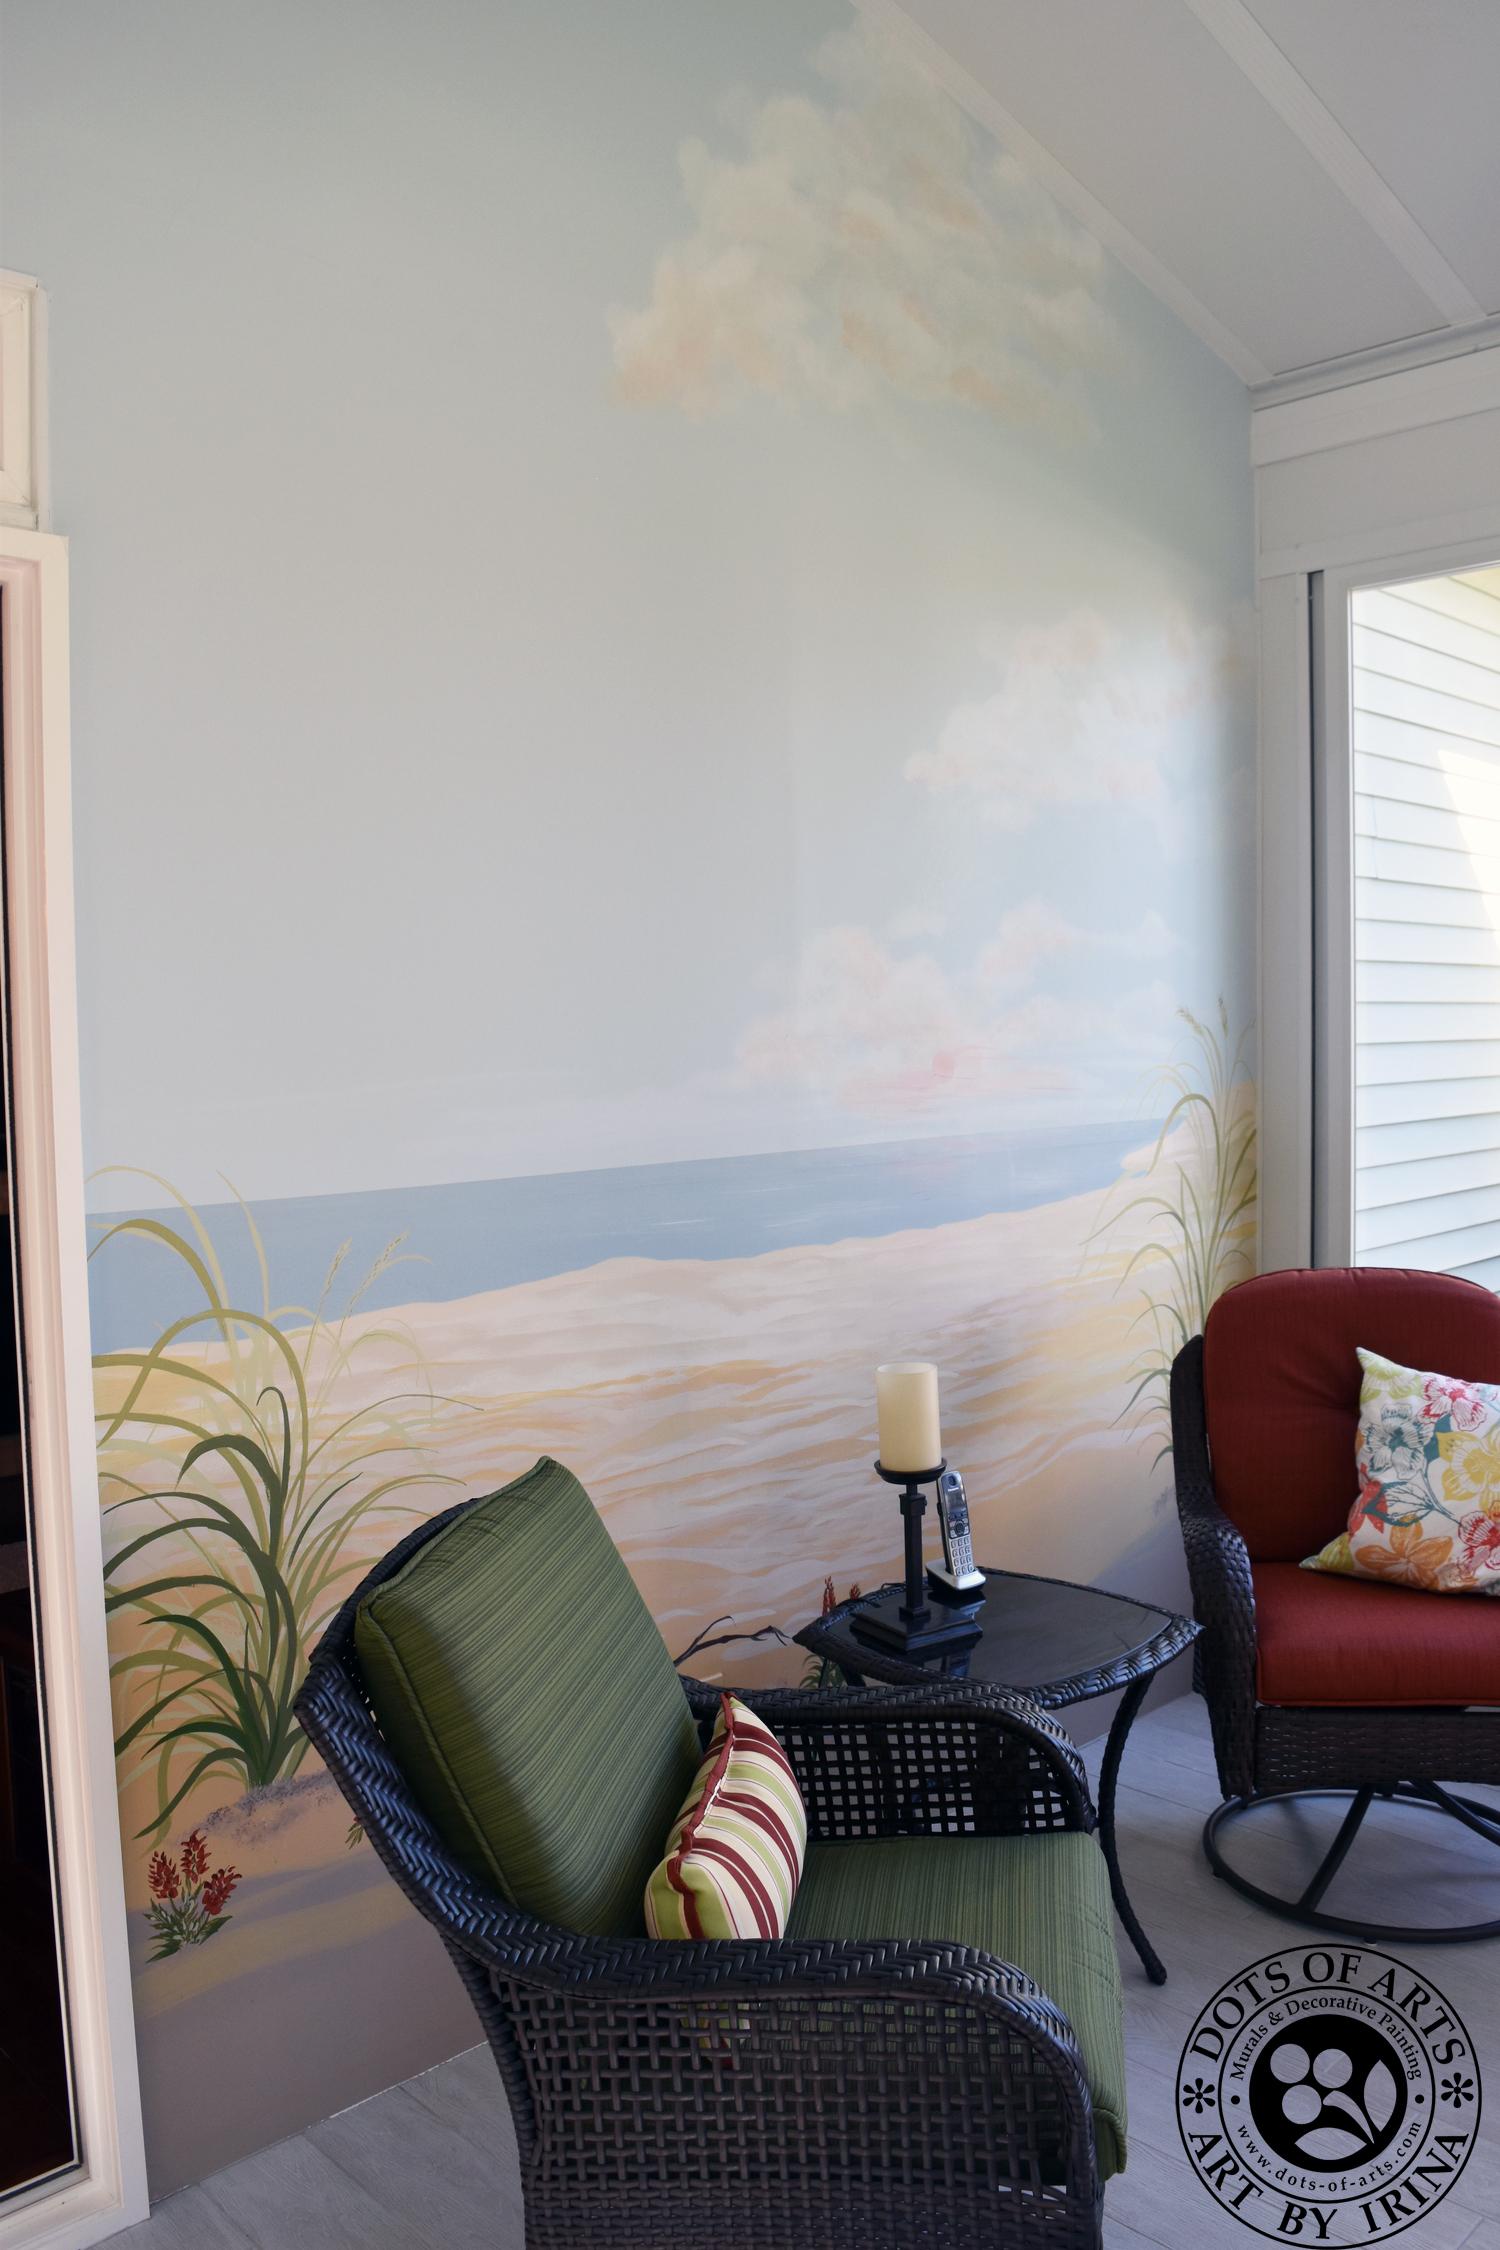 florida-room-mural-full-room-dots-of-arts-chairs.jpg